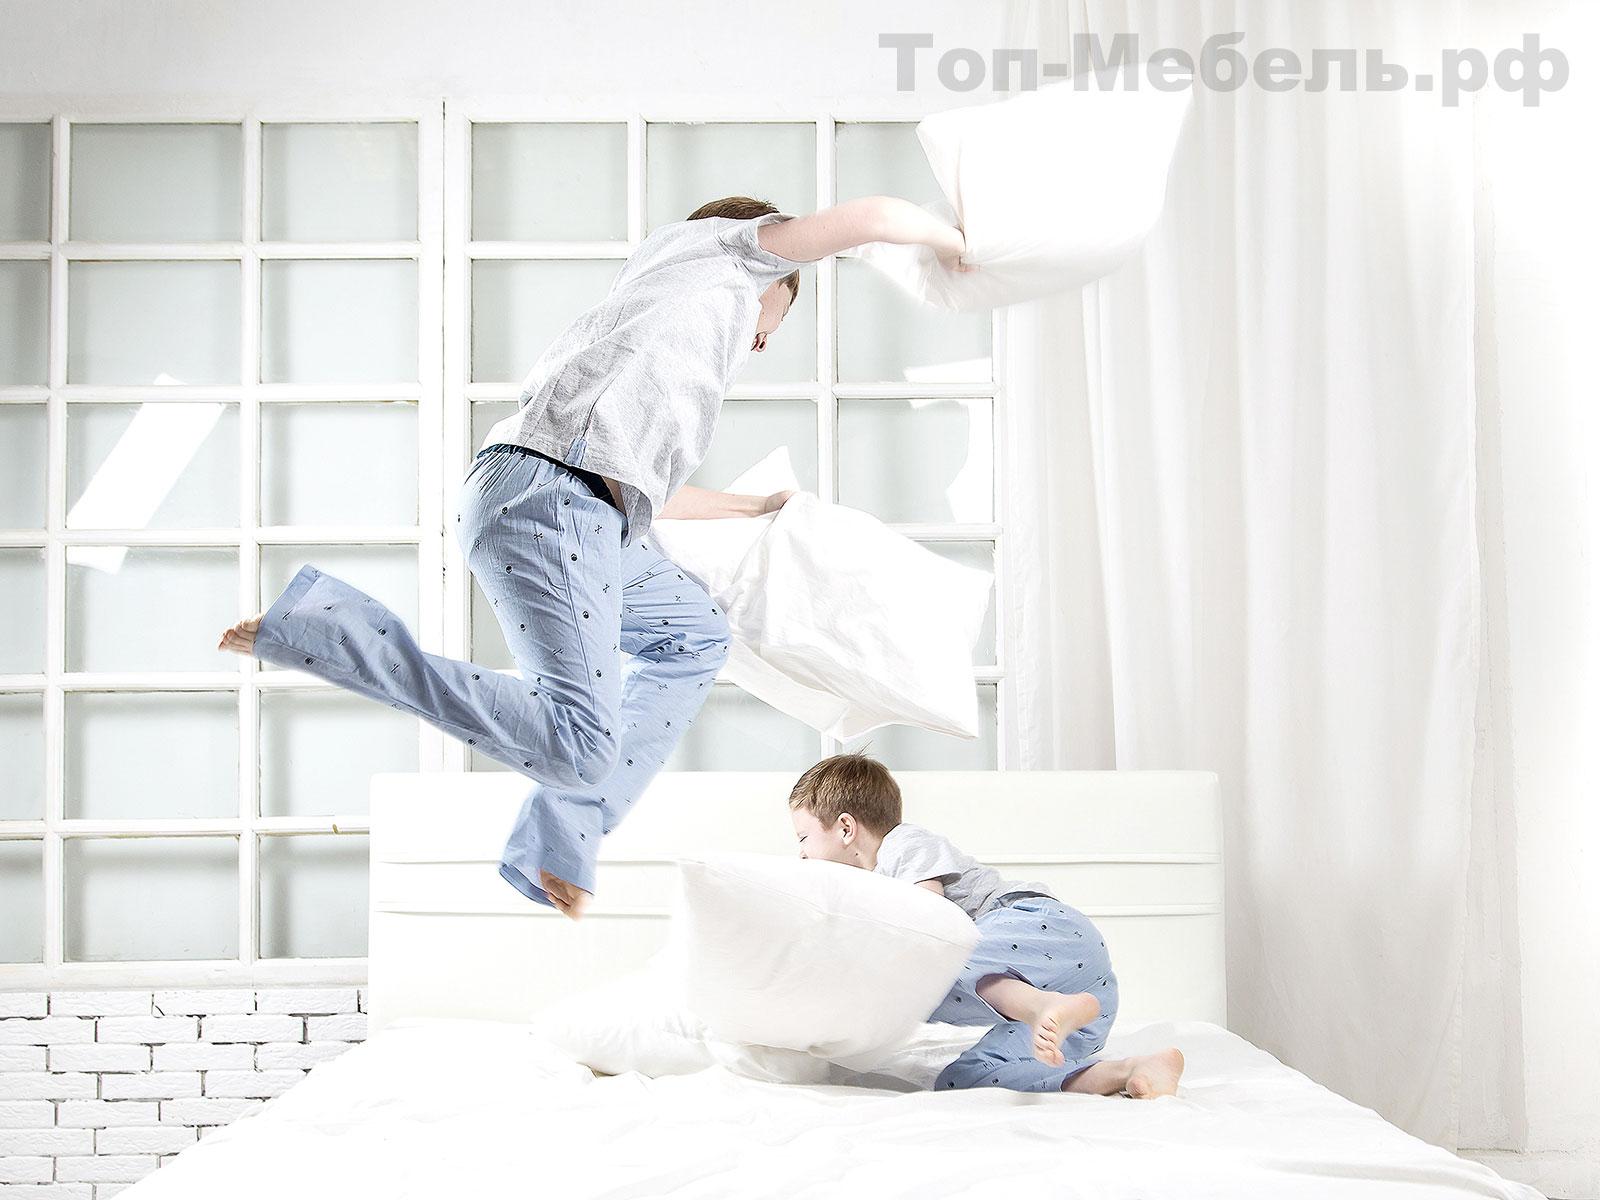 Дети на кровати играют с подушками